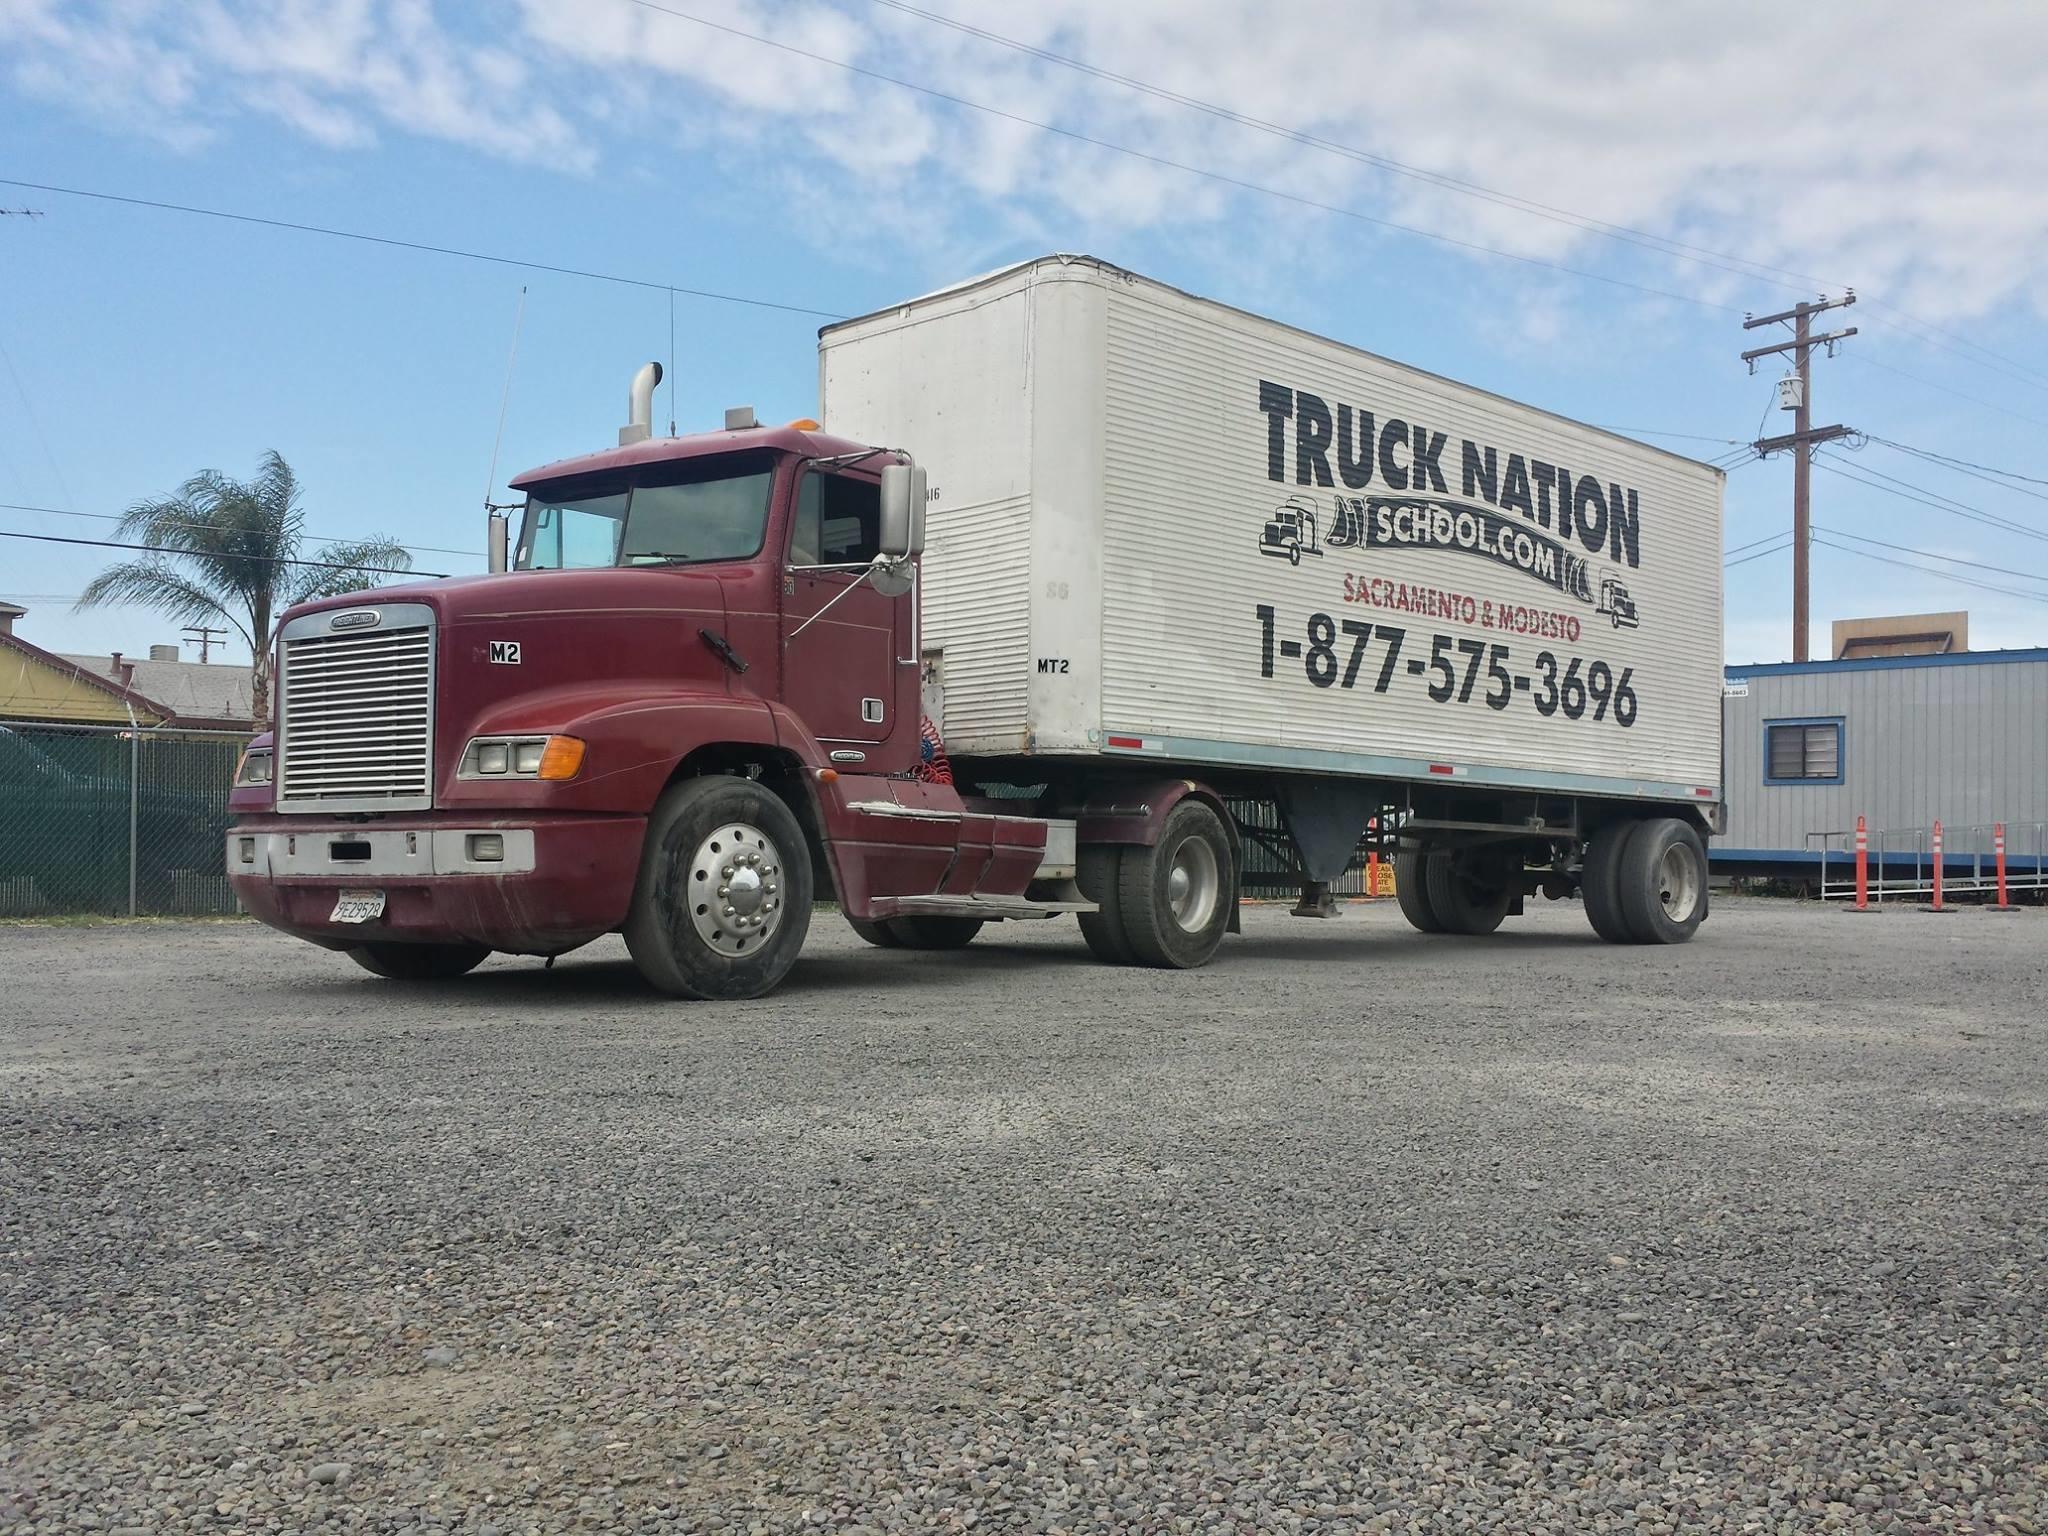 Truck Nation School image 0